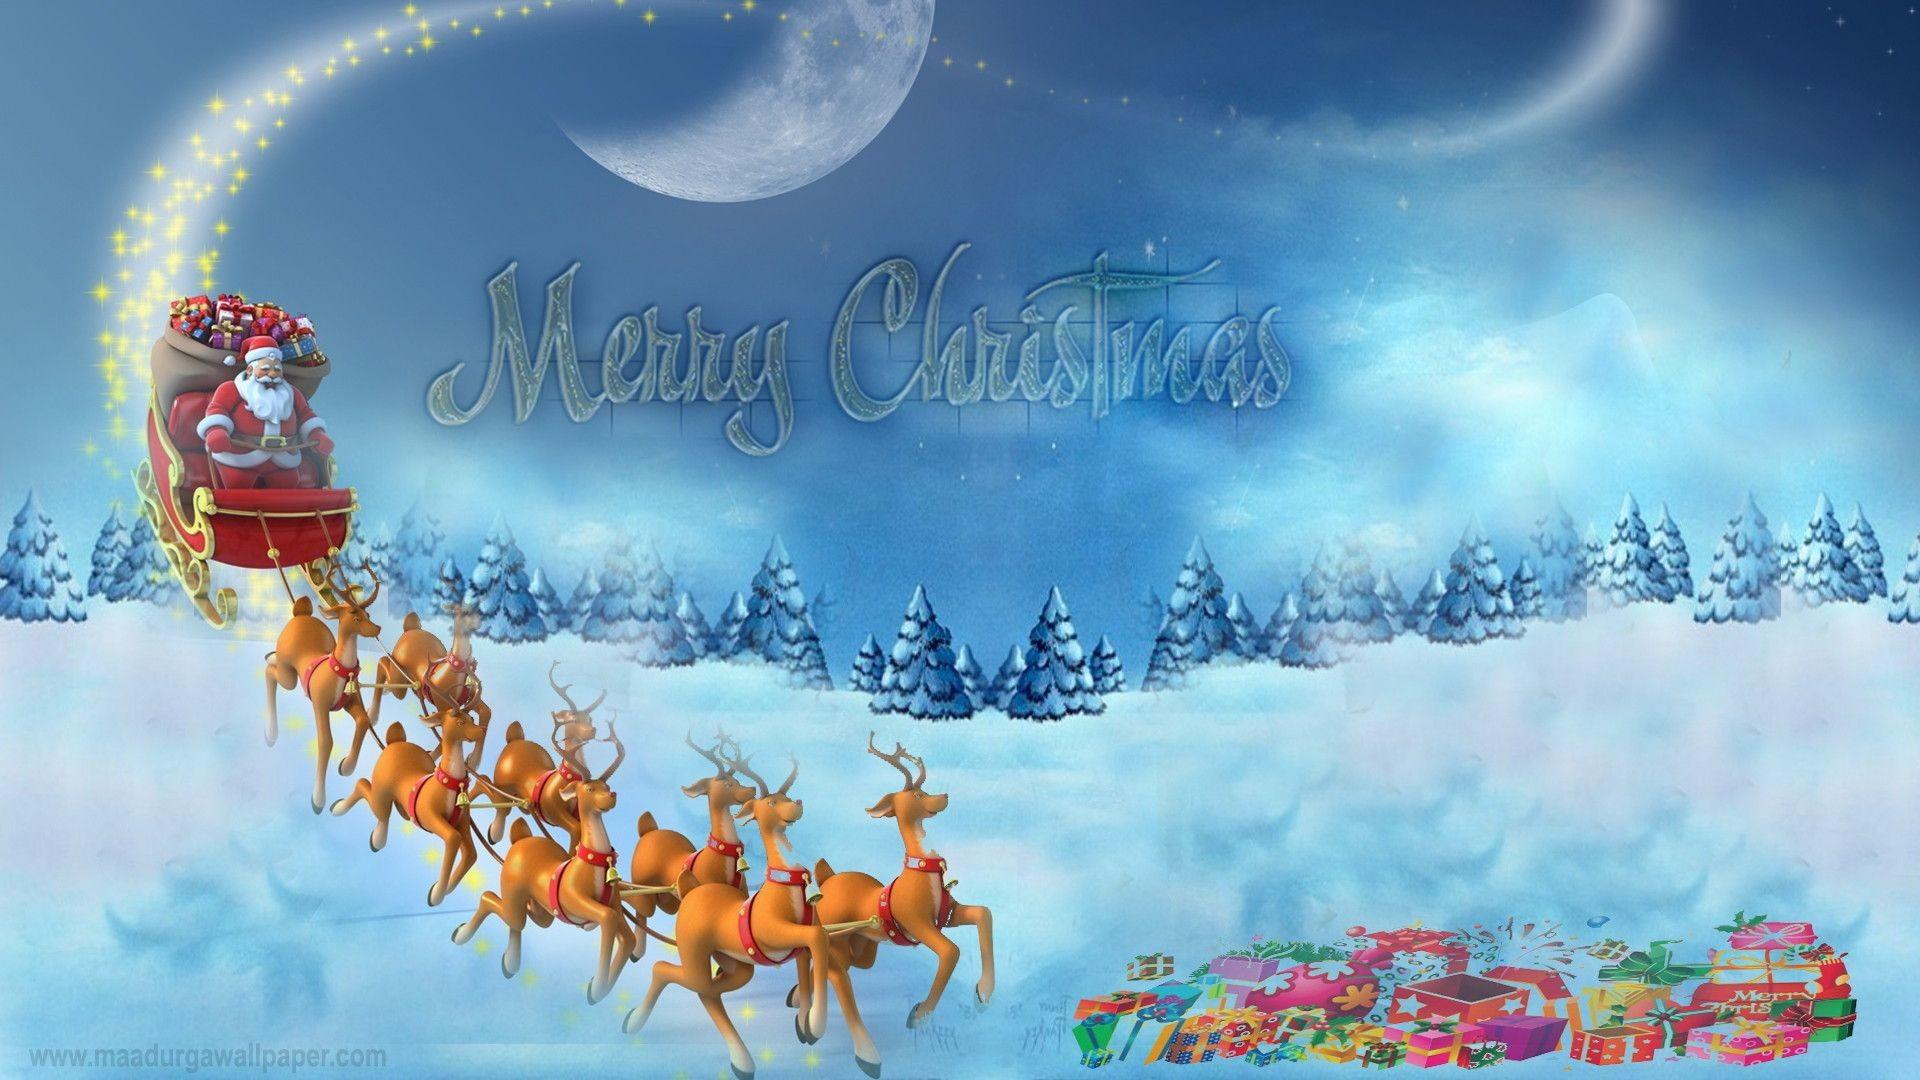 Res: 1920x1080, Christmas wallpaper